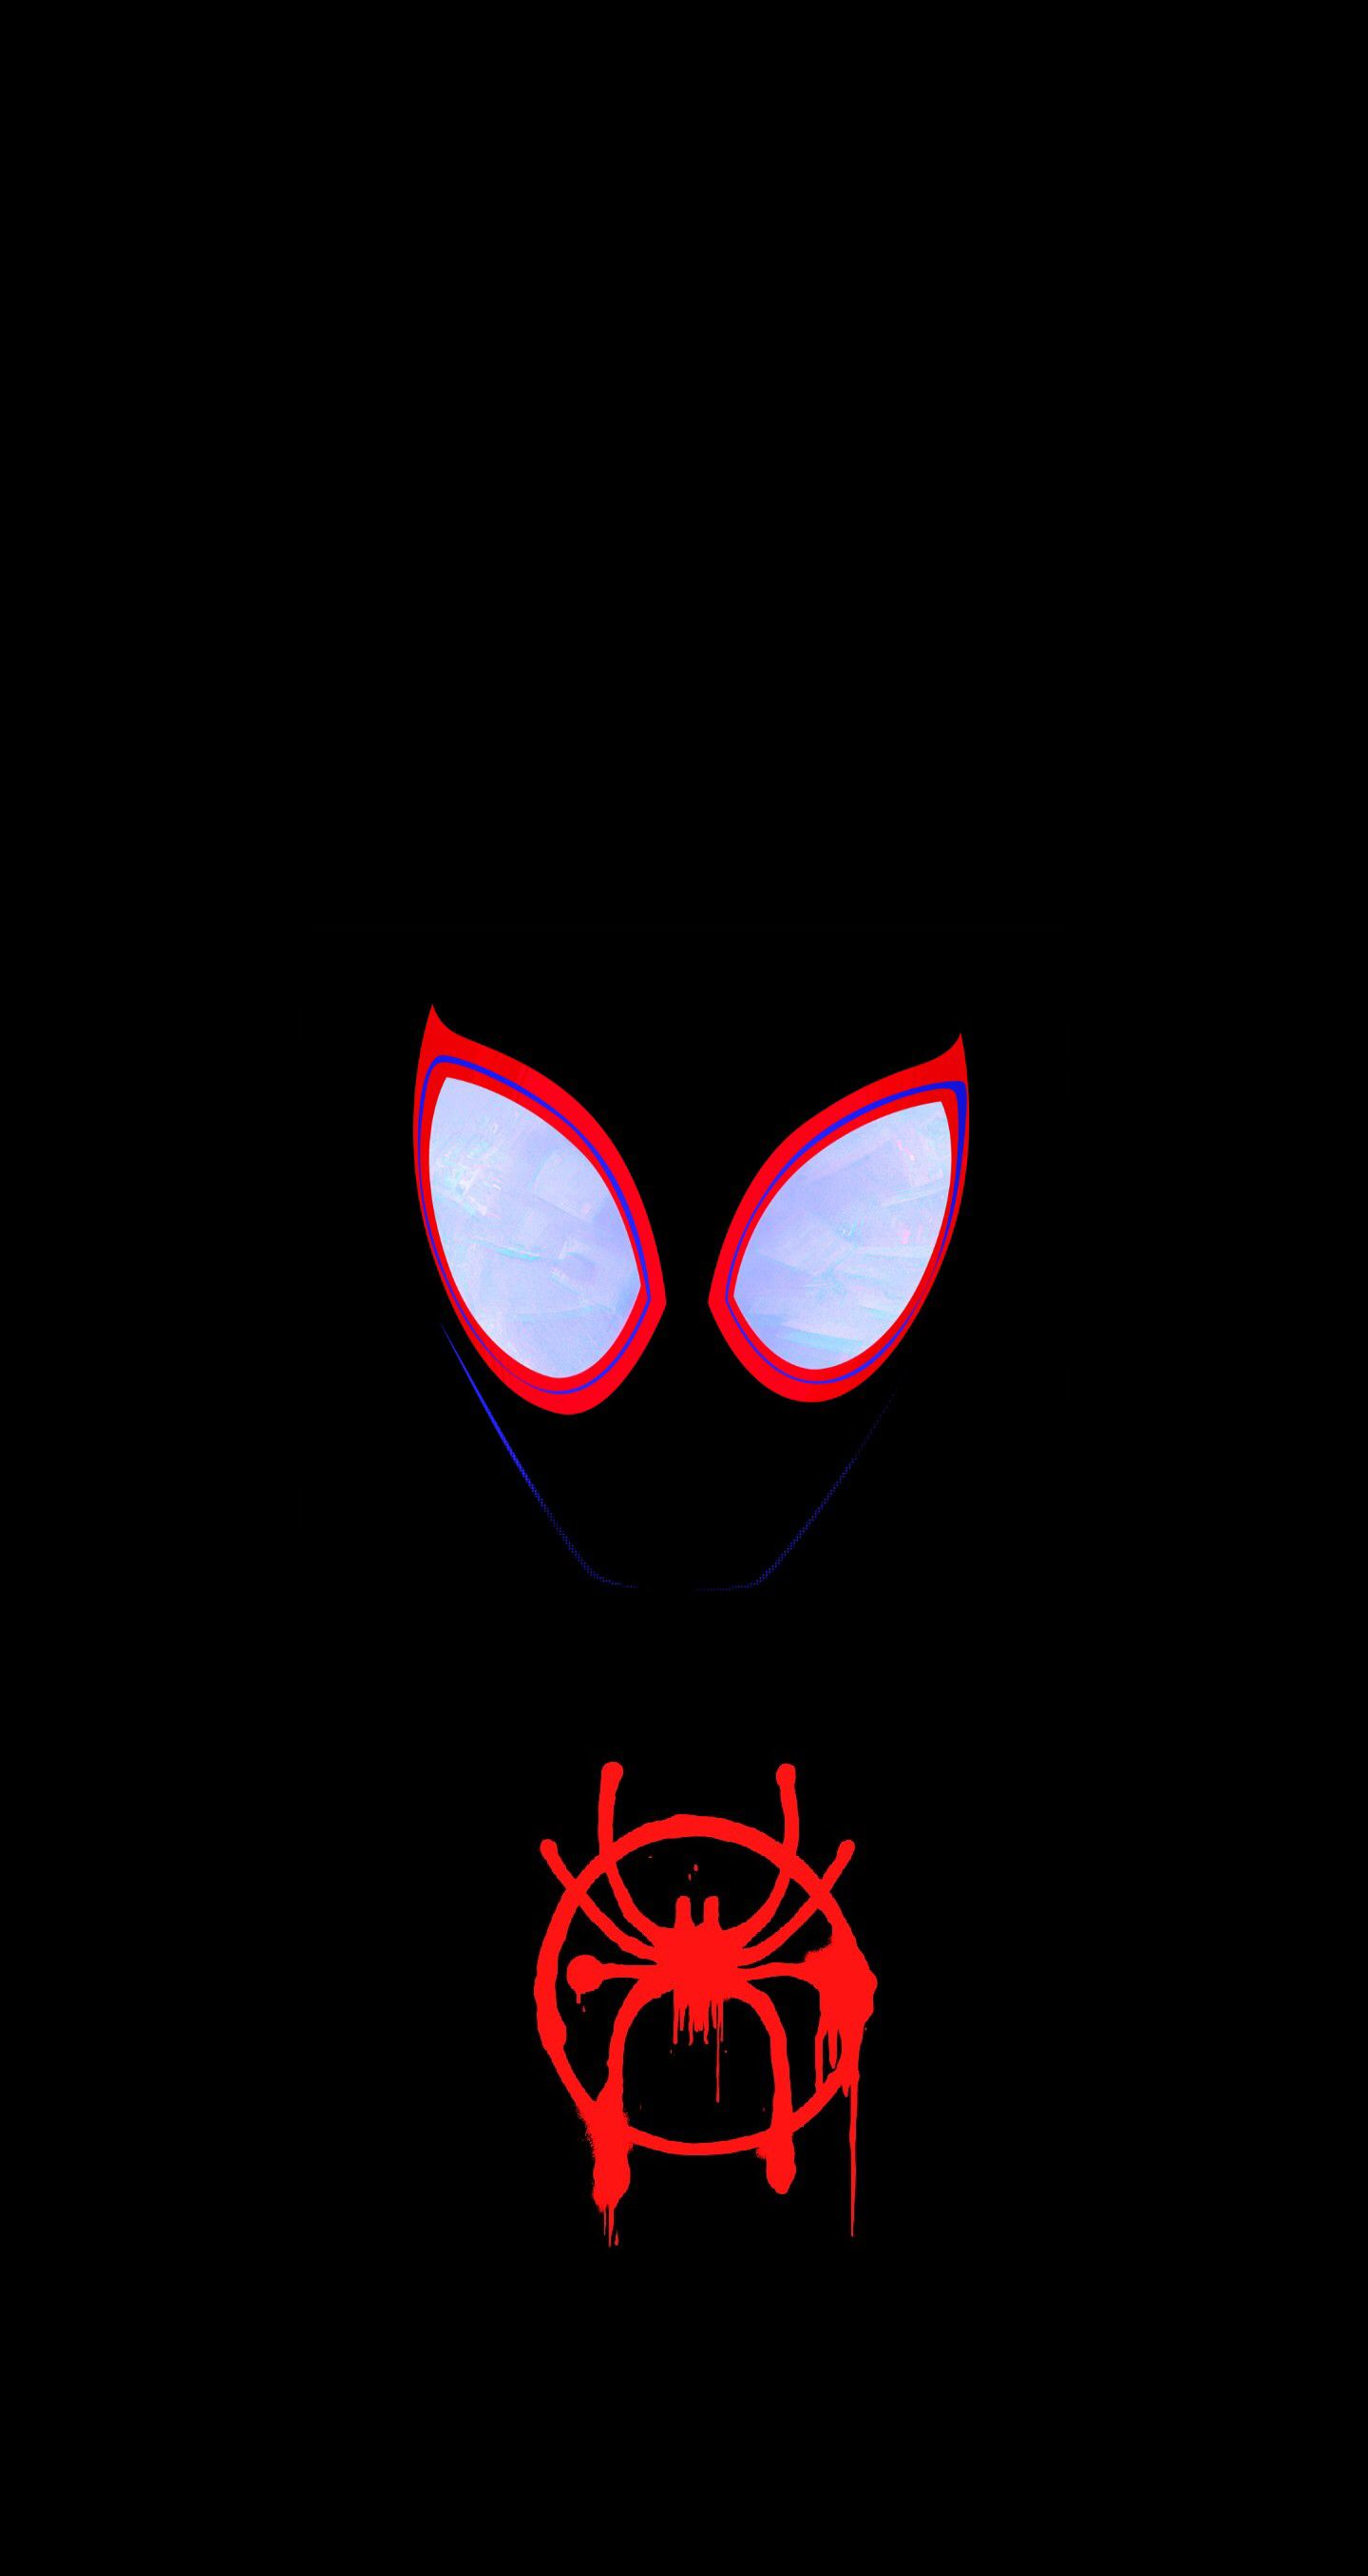 Free Download Miles Morales Spider Verse Spiderman Spiderman